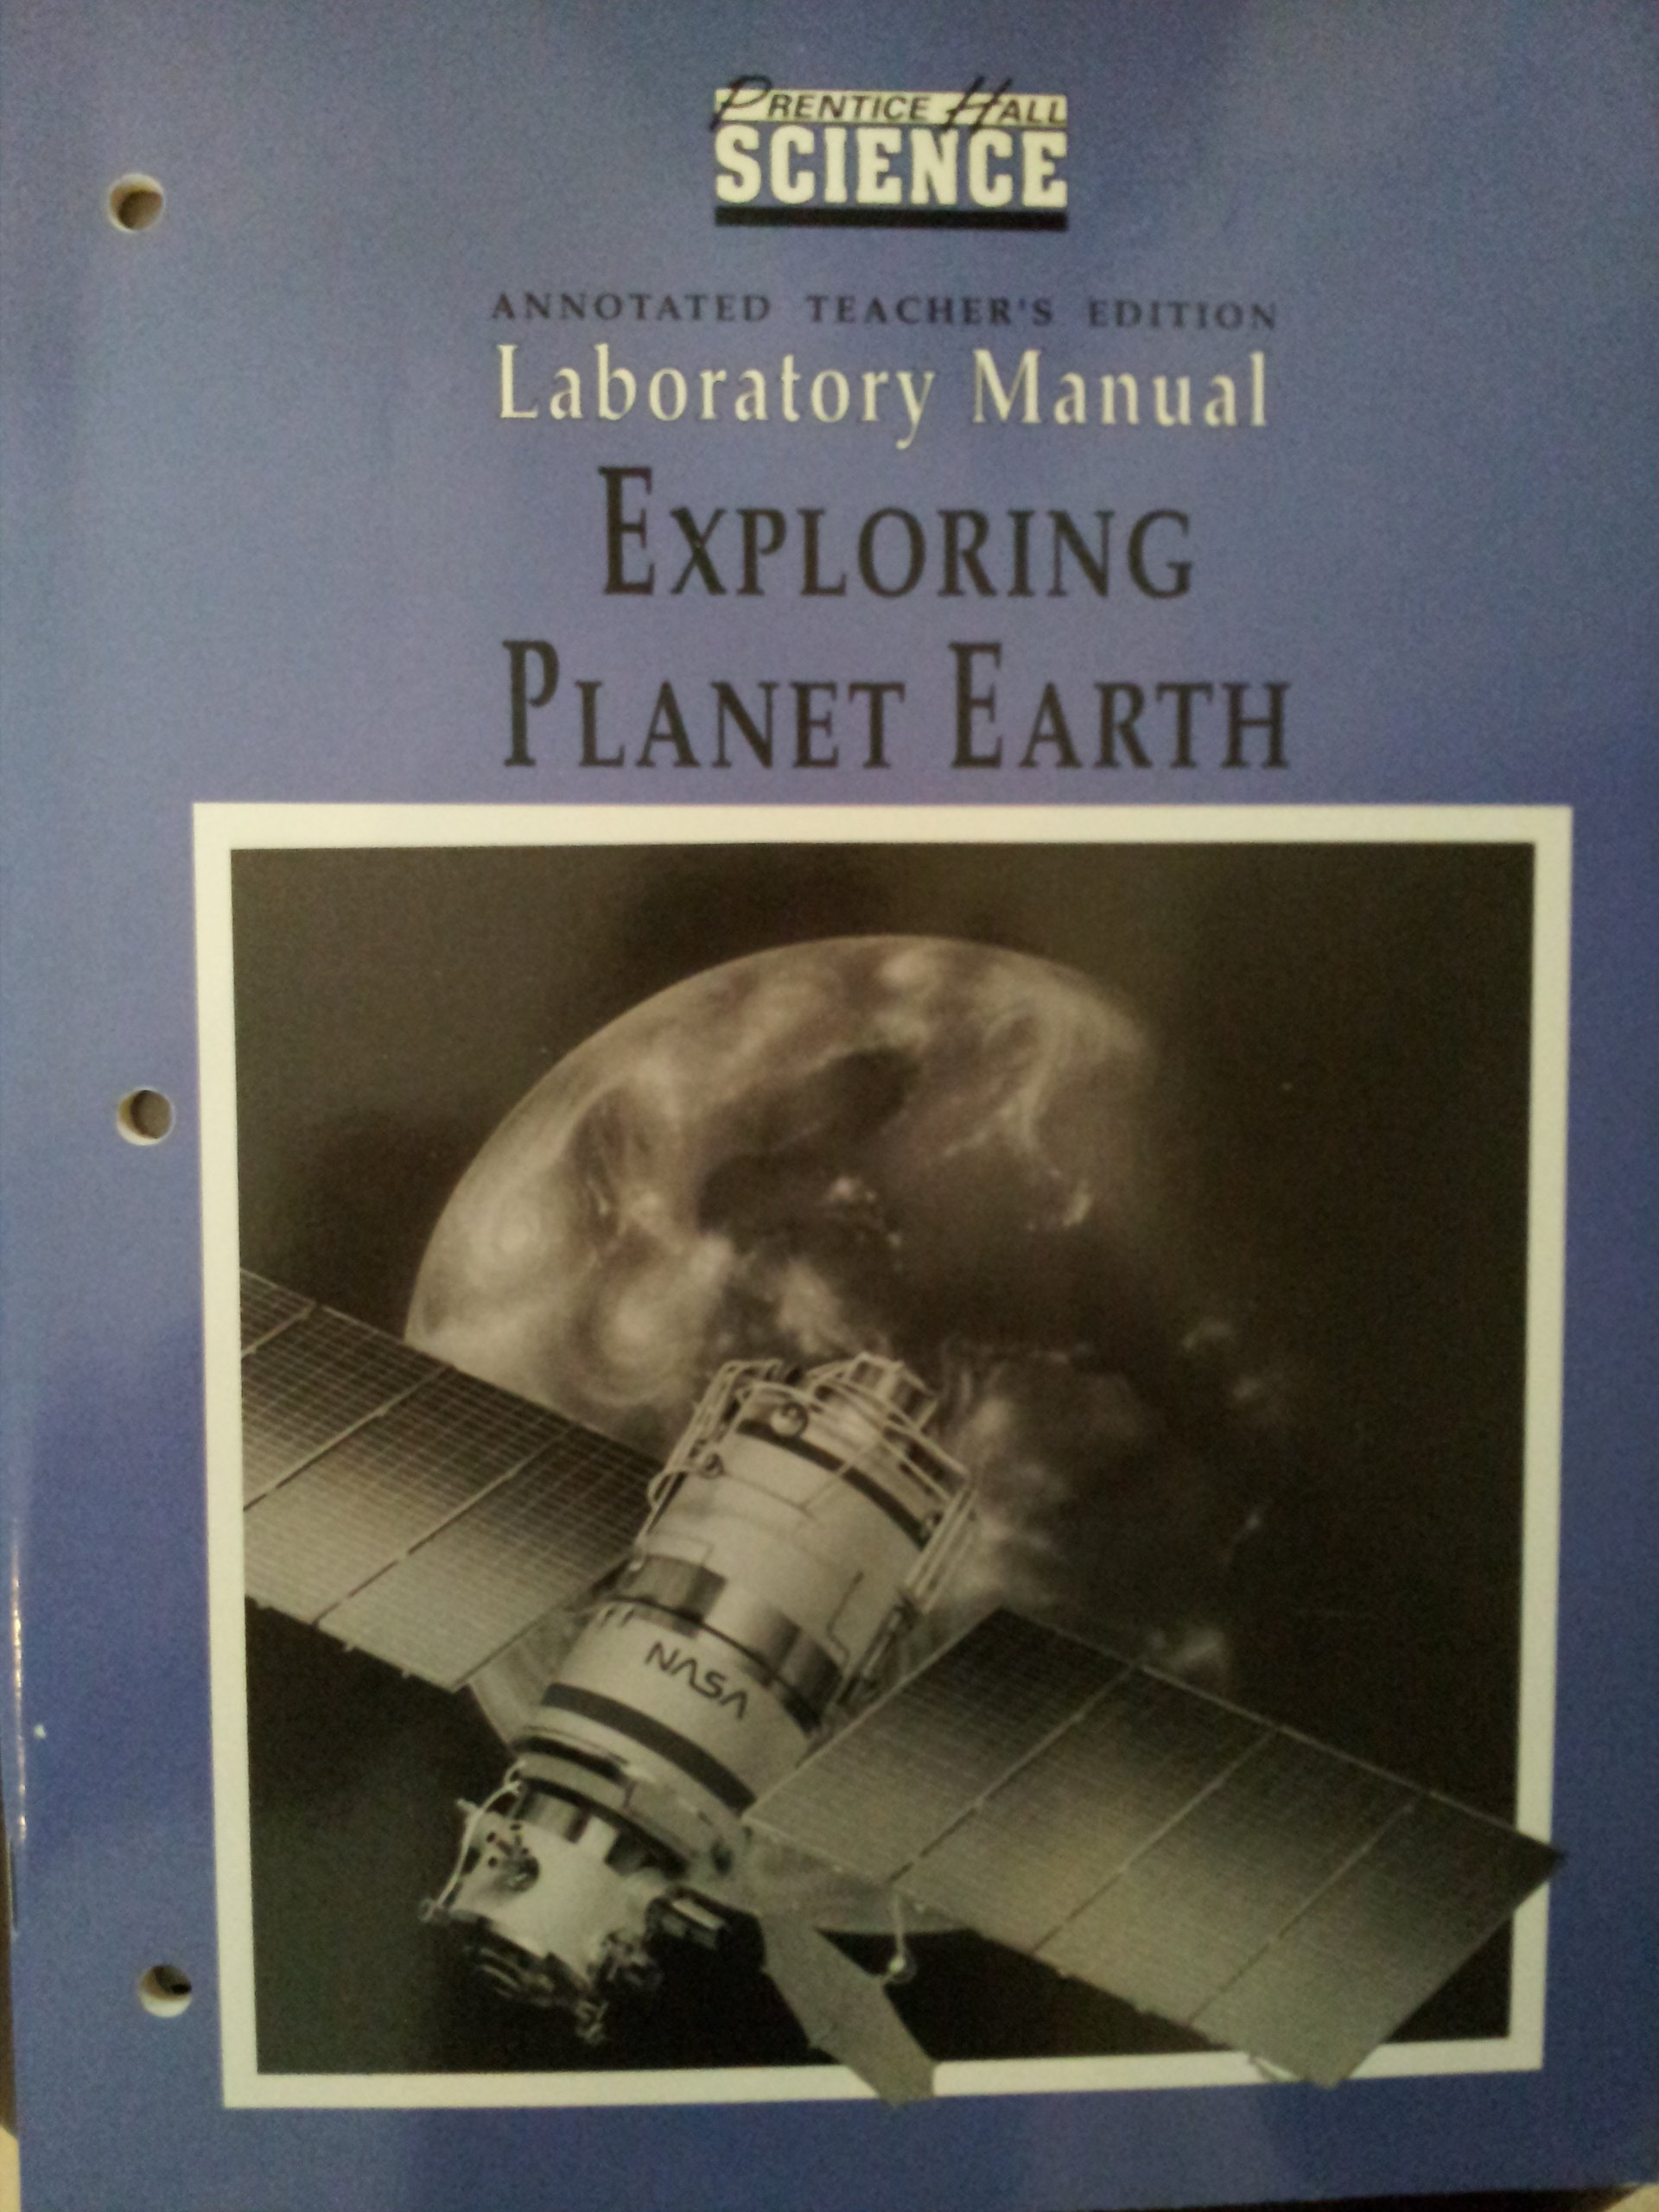 Exploring Planet Earth Laboratory Manual (Prentice Hall Science): Prentice  Hall Staff: 9780139862663: Amazon.com: Books